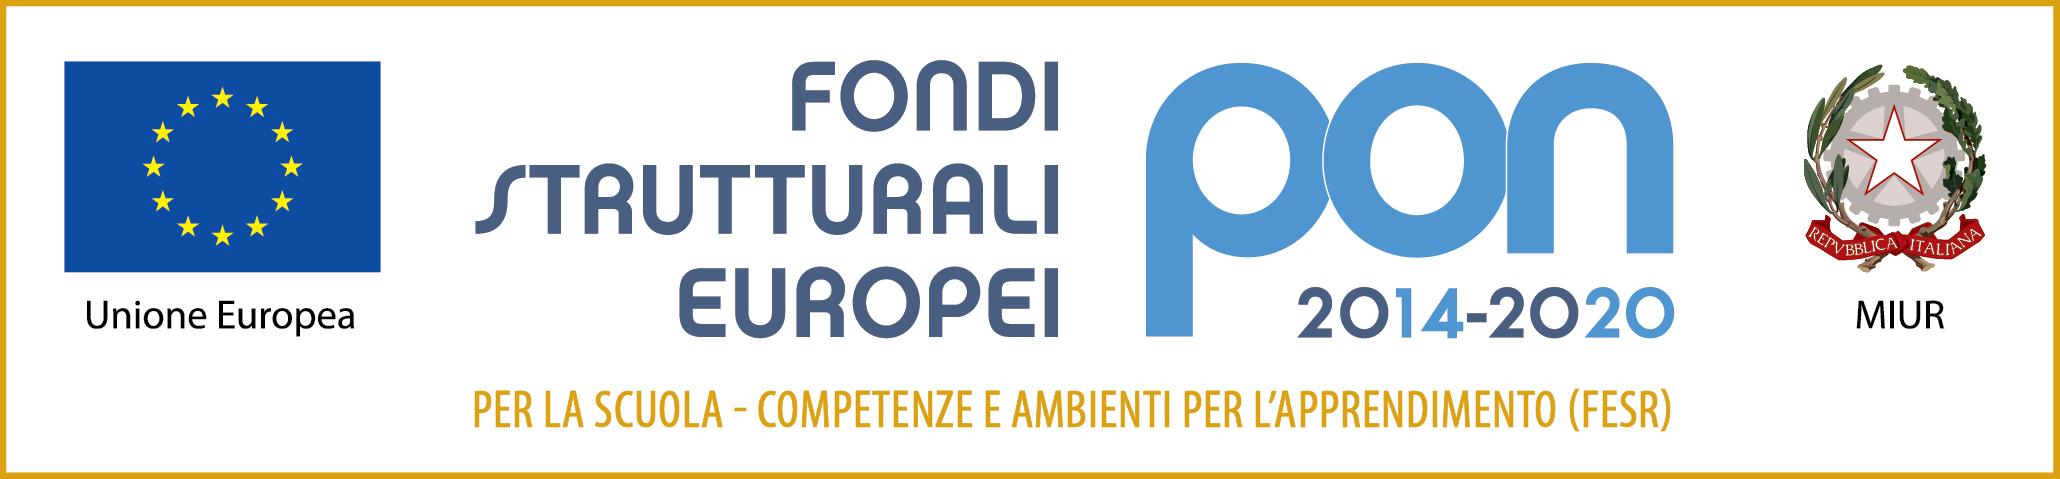 PON-fondi Strutturali Europei-Scuola beneficiaria